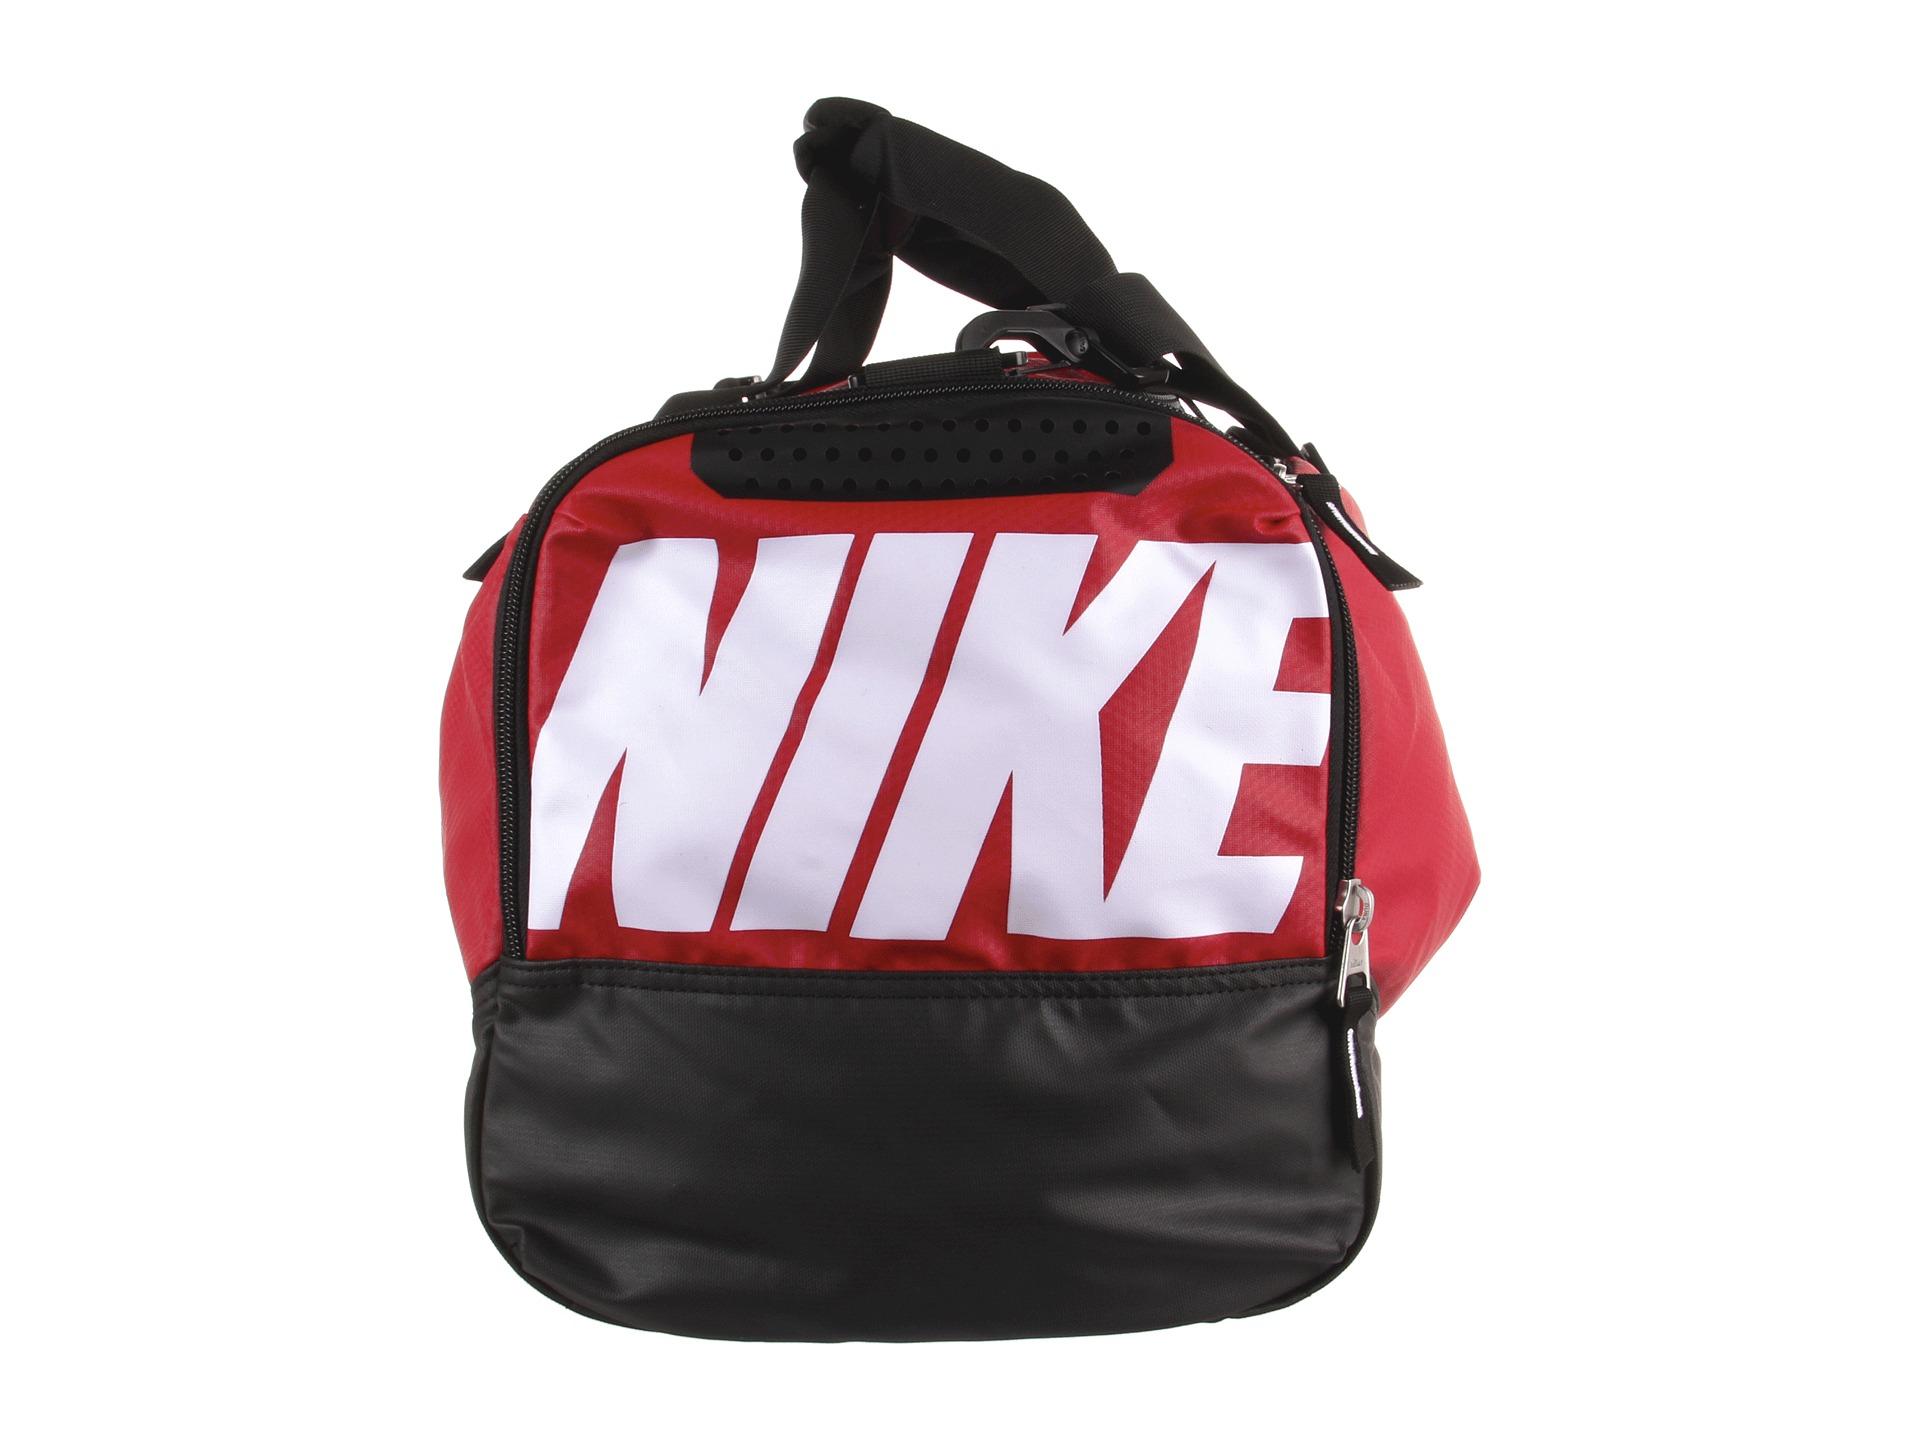 Nike Small Red Duffle Bag  e2e0e4286d1c9